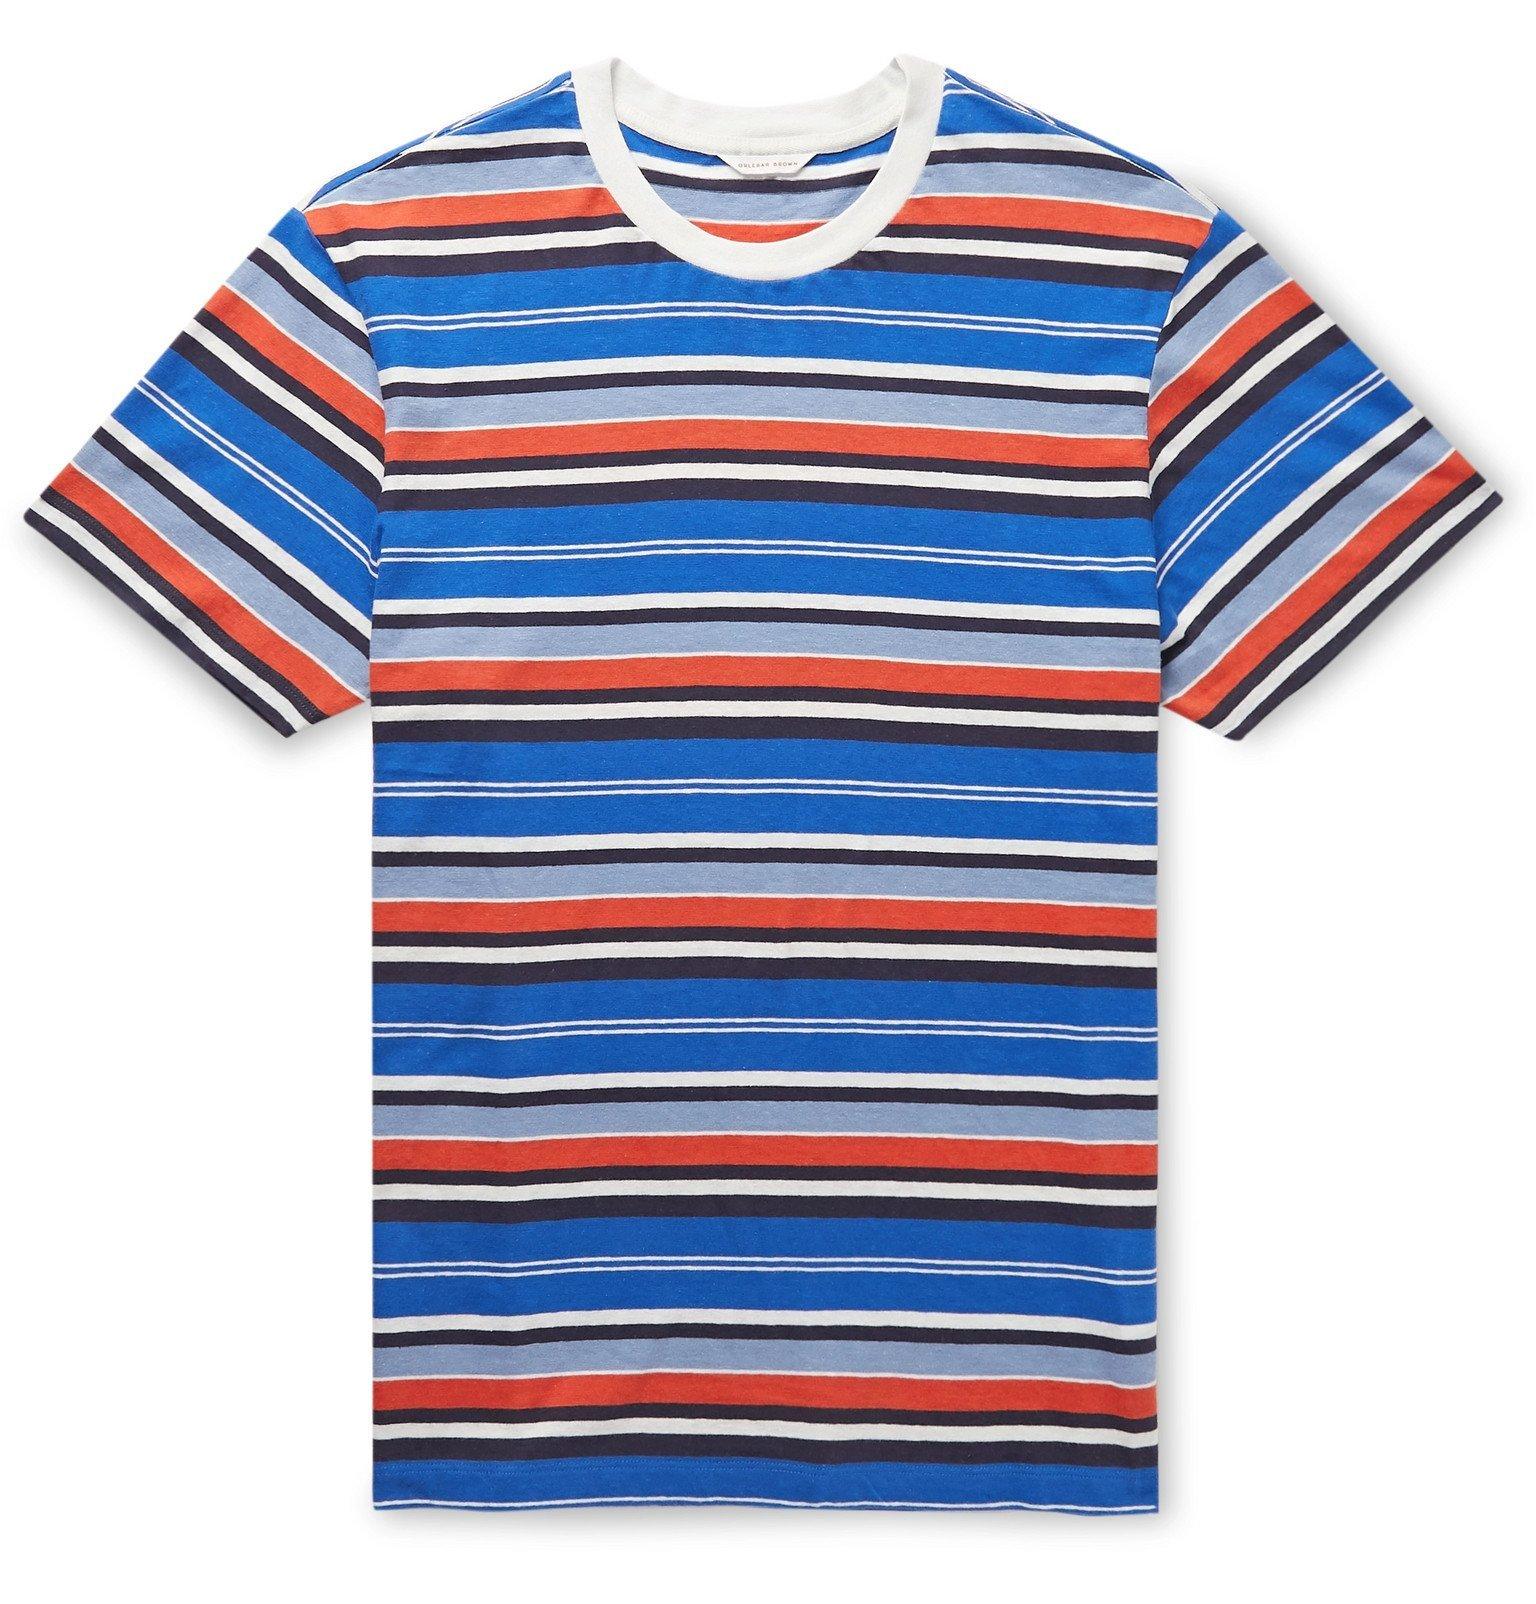 Photo: Orlebar Brown - Sammy Striped Cotton and Linen-Blend T-Shirt - Blue